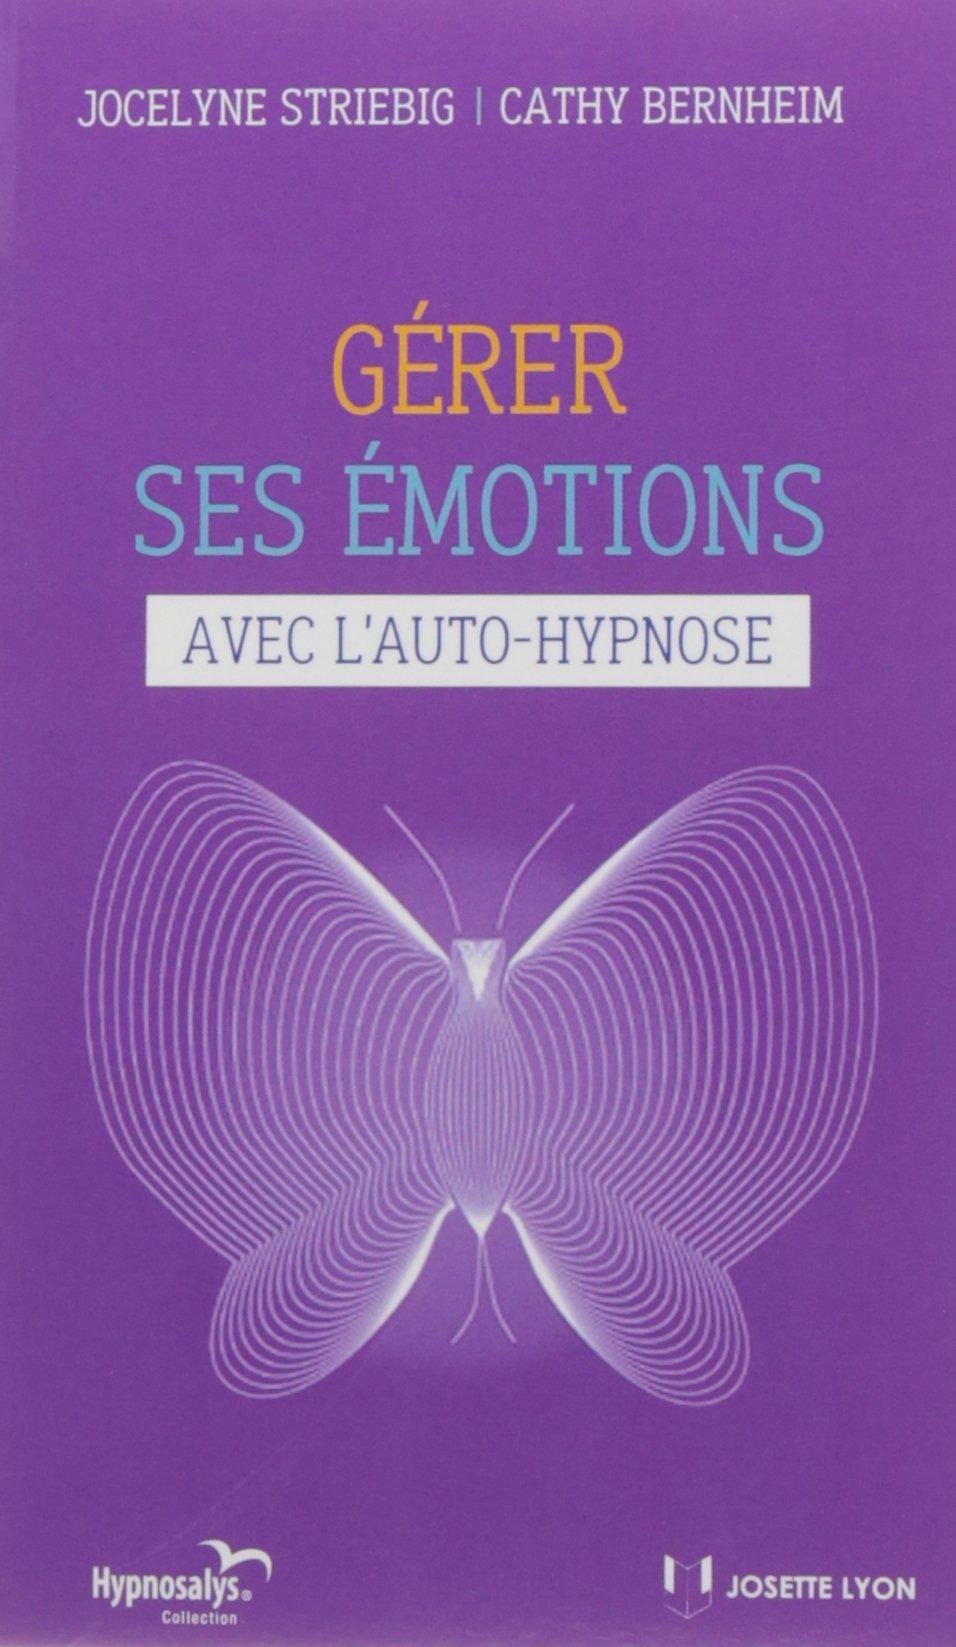 Gérer ses émotions avec l'auto-hypnose Broché – 9 novembre 2016 Jocelyne Striebig Cathy Bernheim Josette Lyon 2843193850